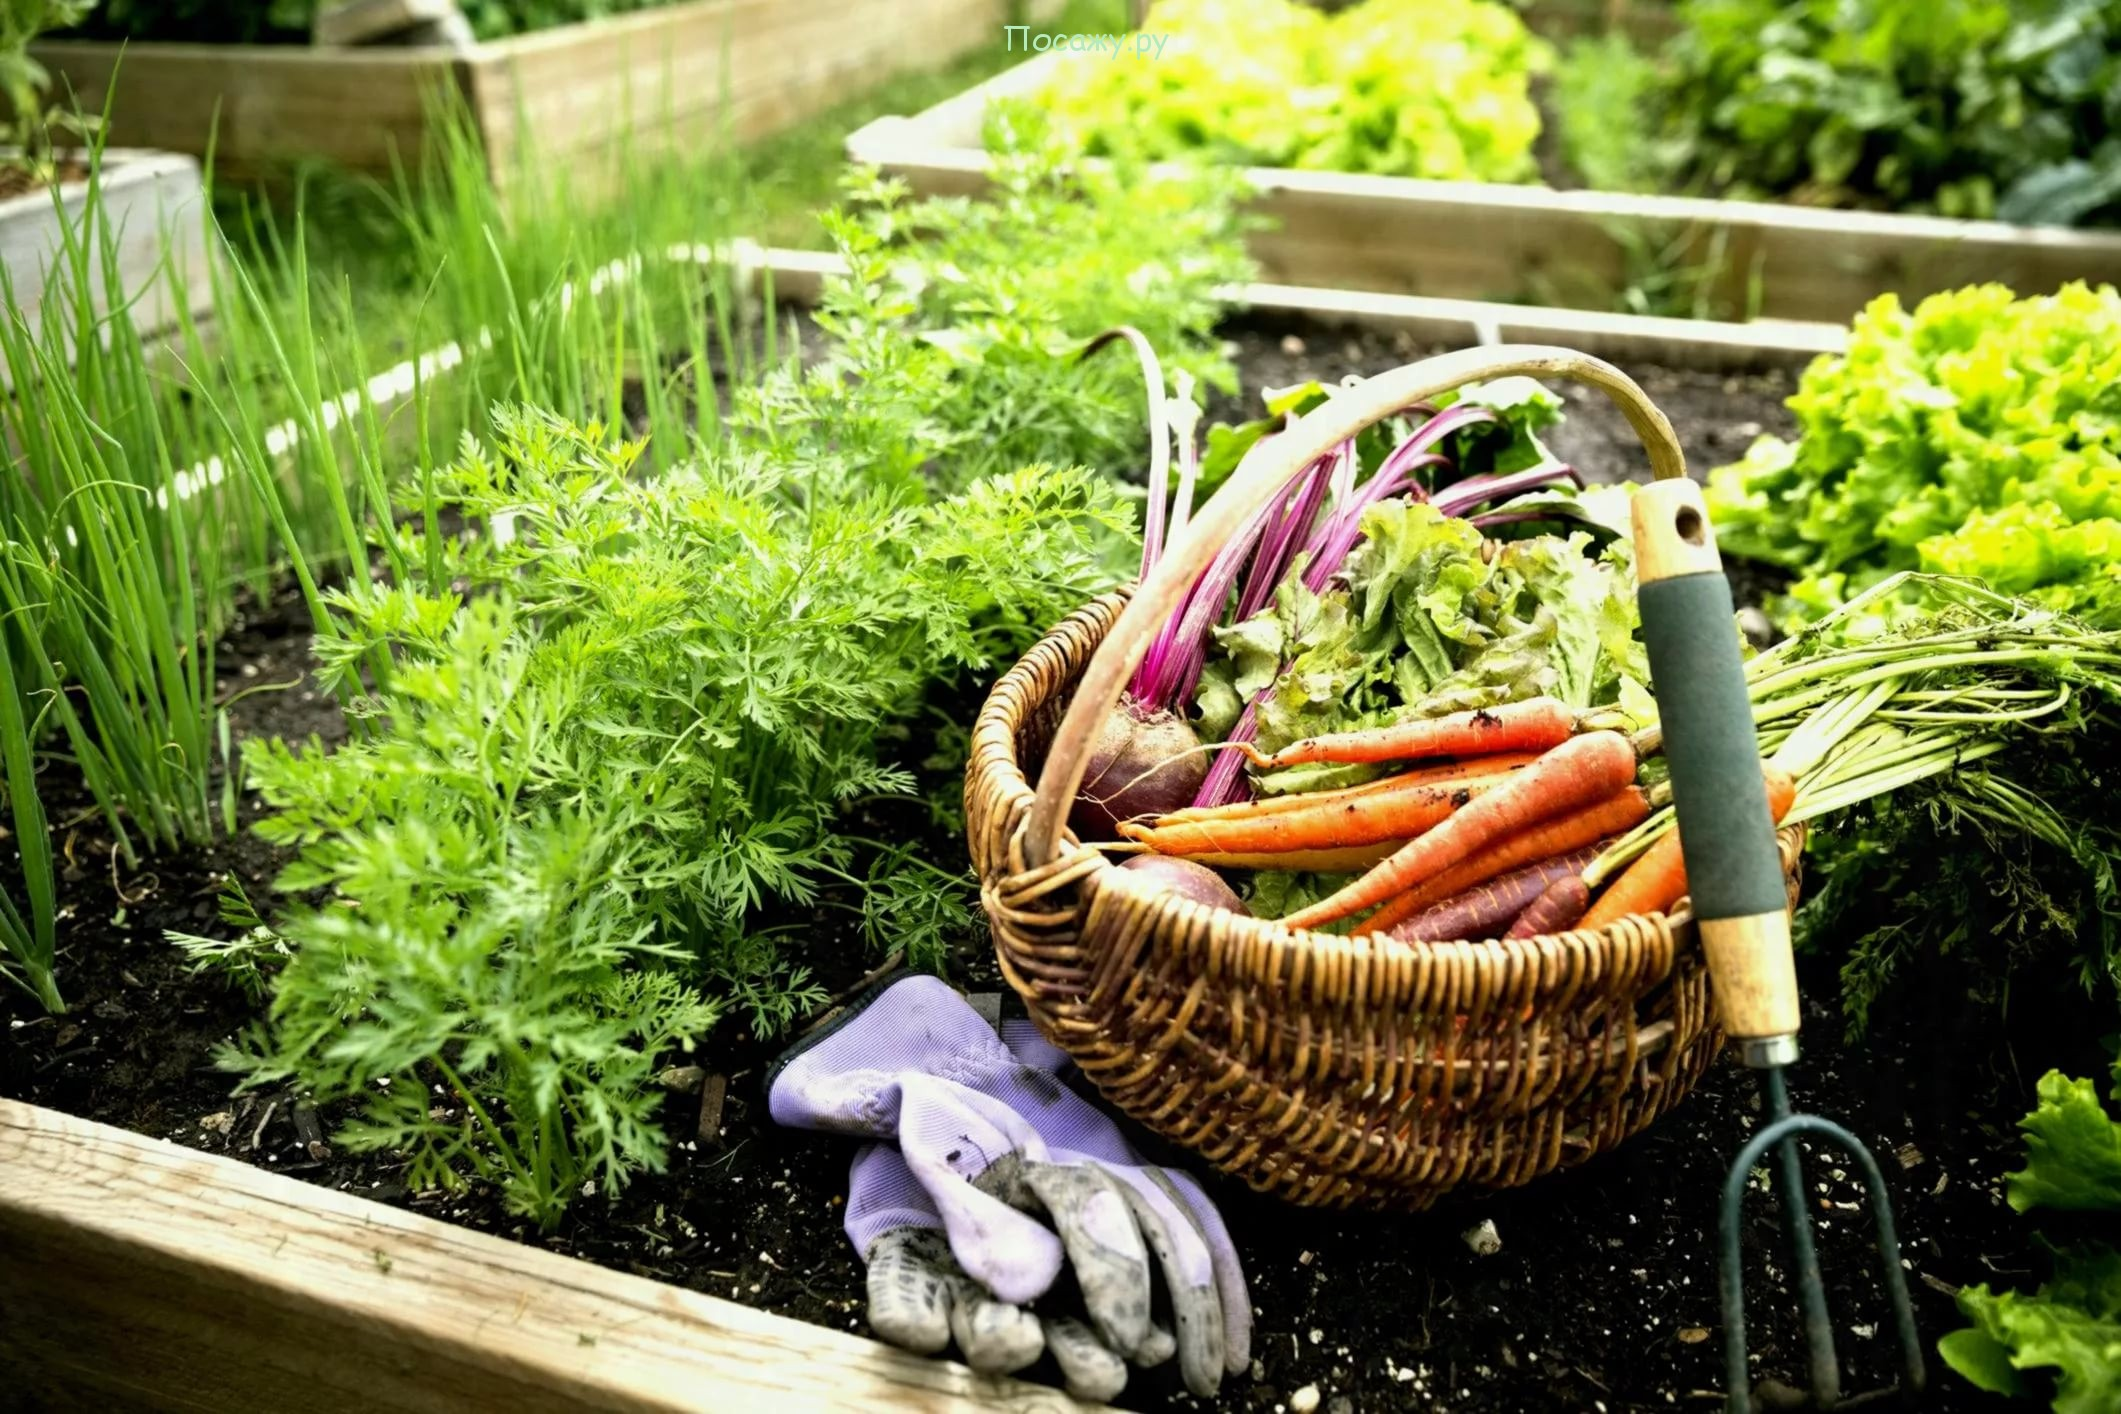 картинки клумбы сад и огородника супа